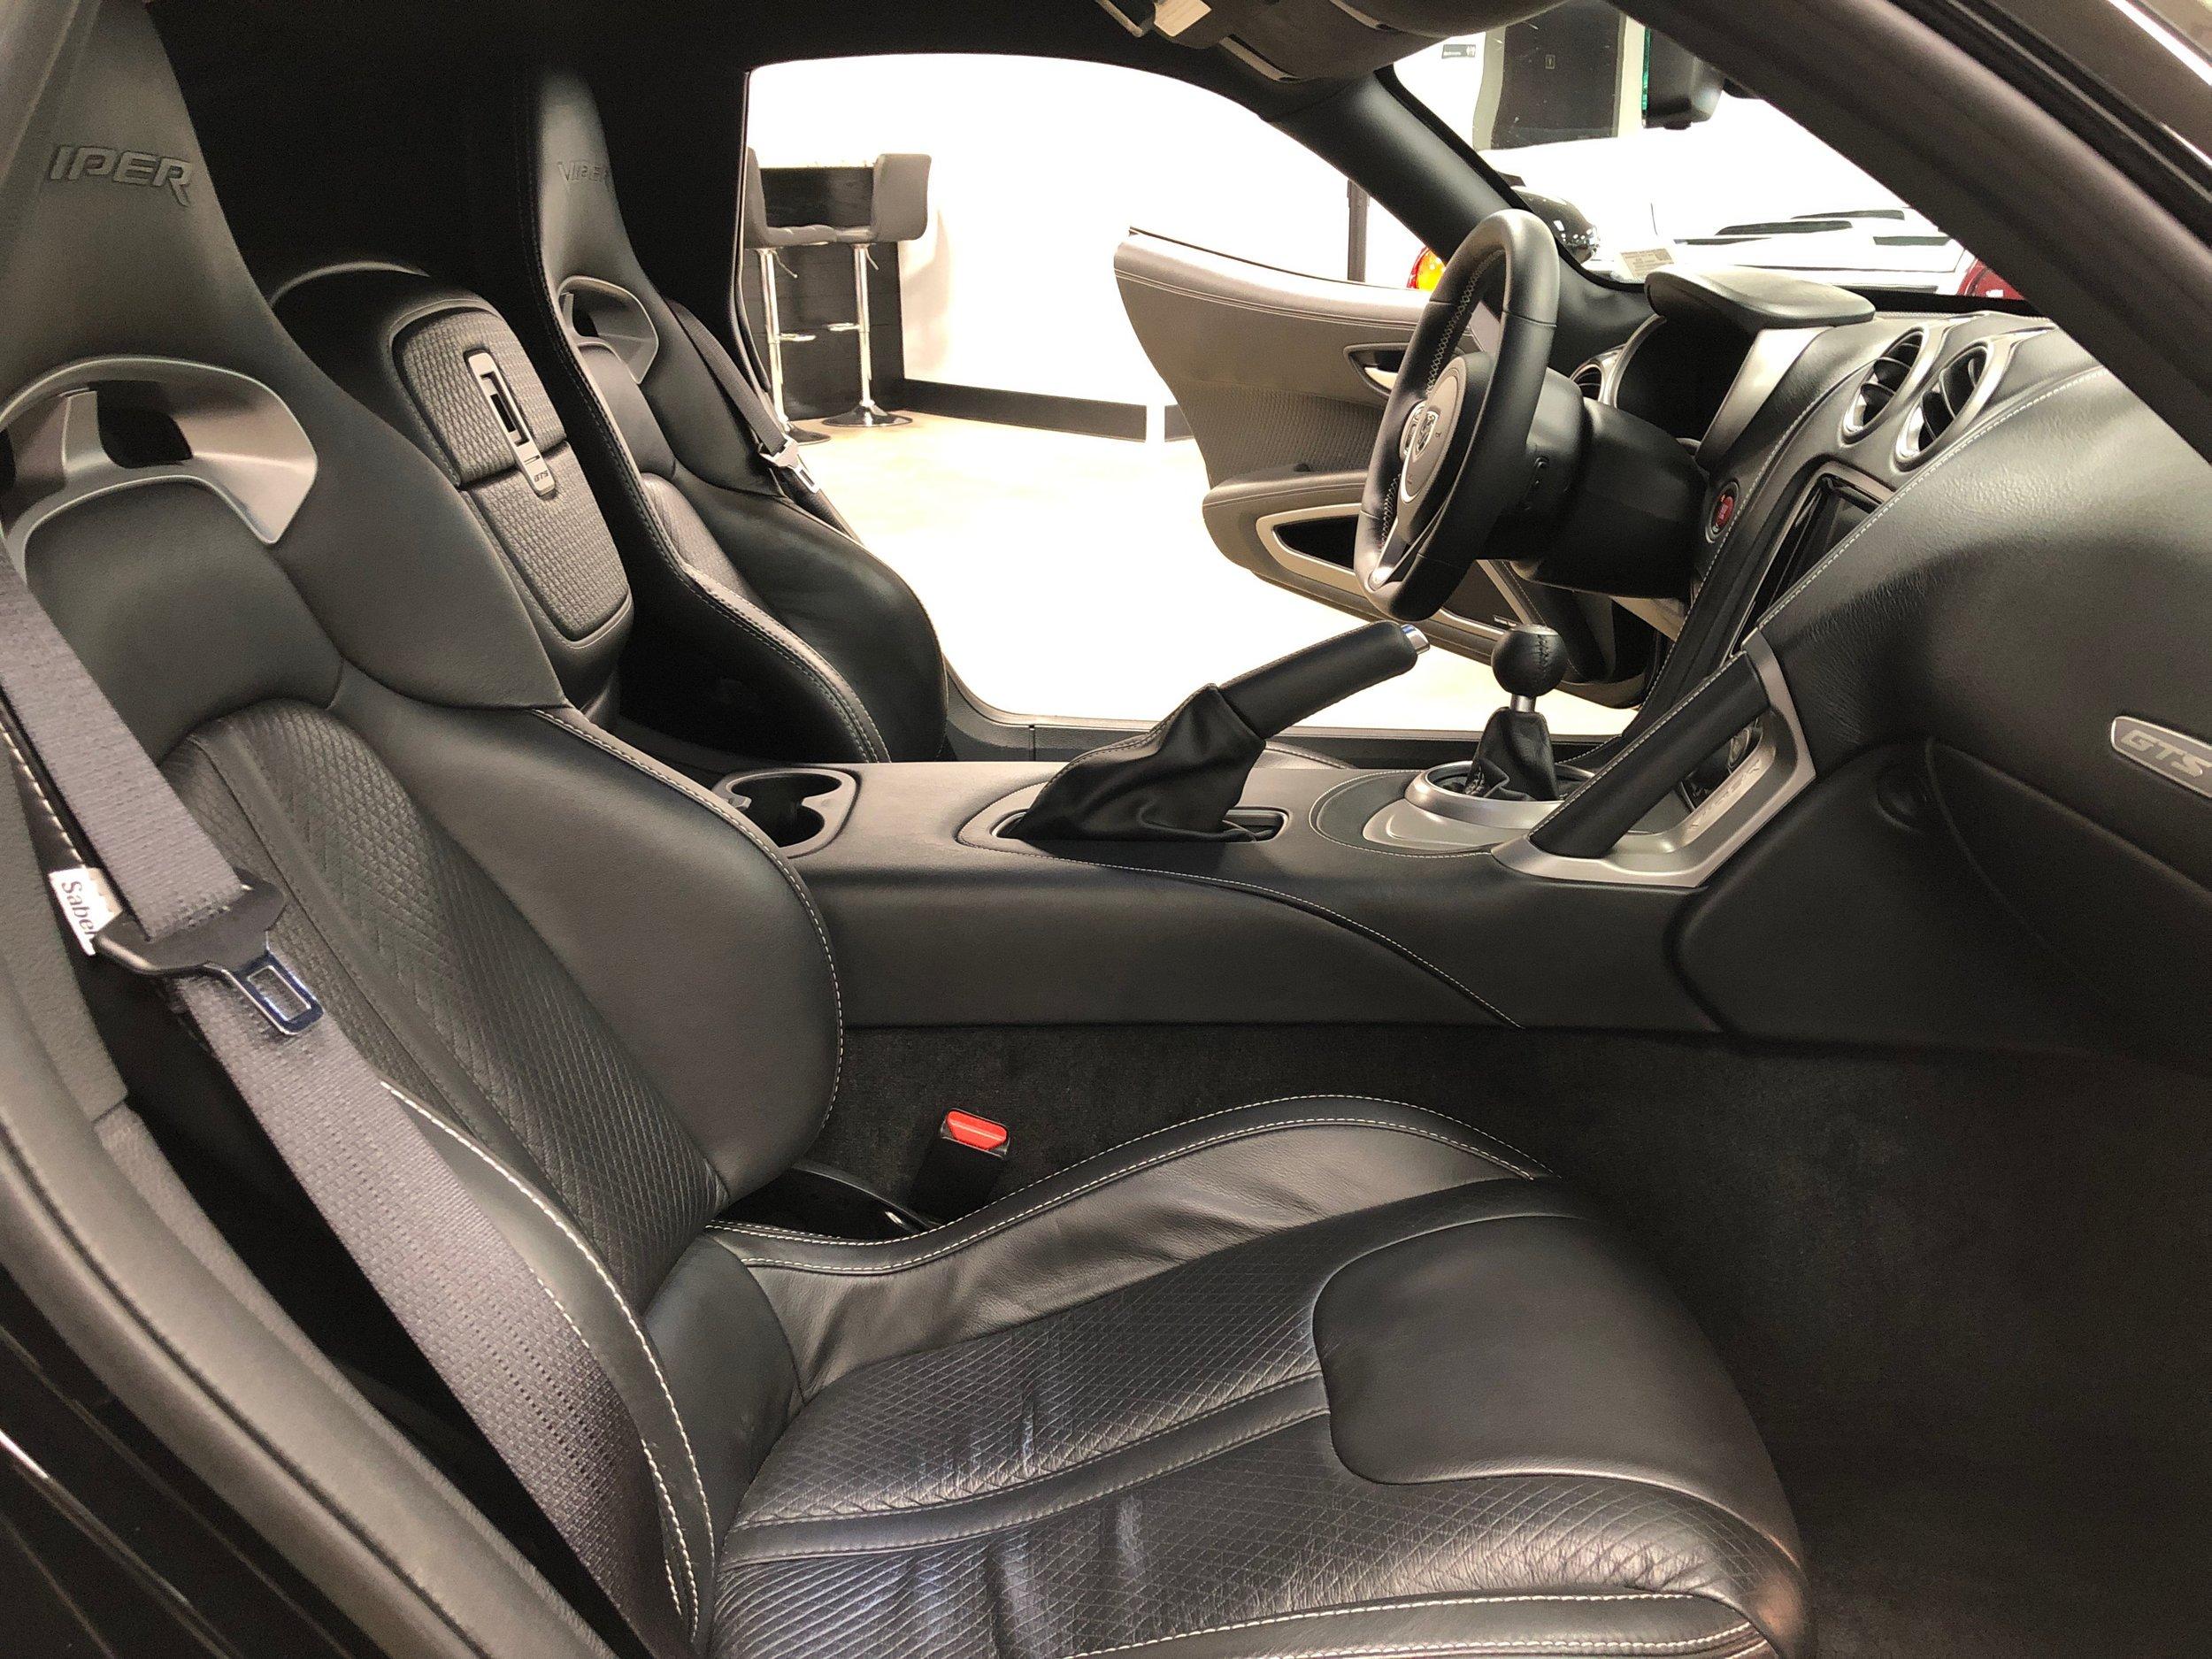 2014 Dodge Viper GTS  Front Interior